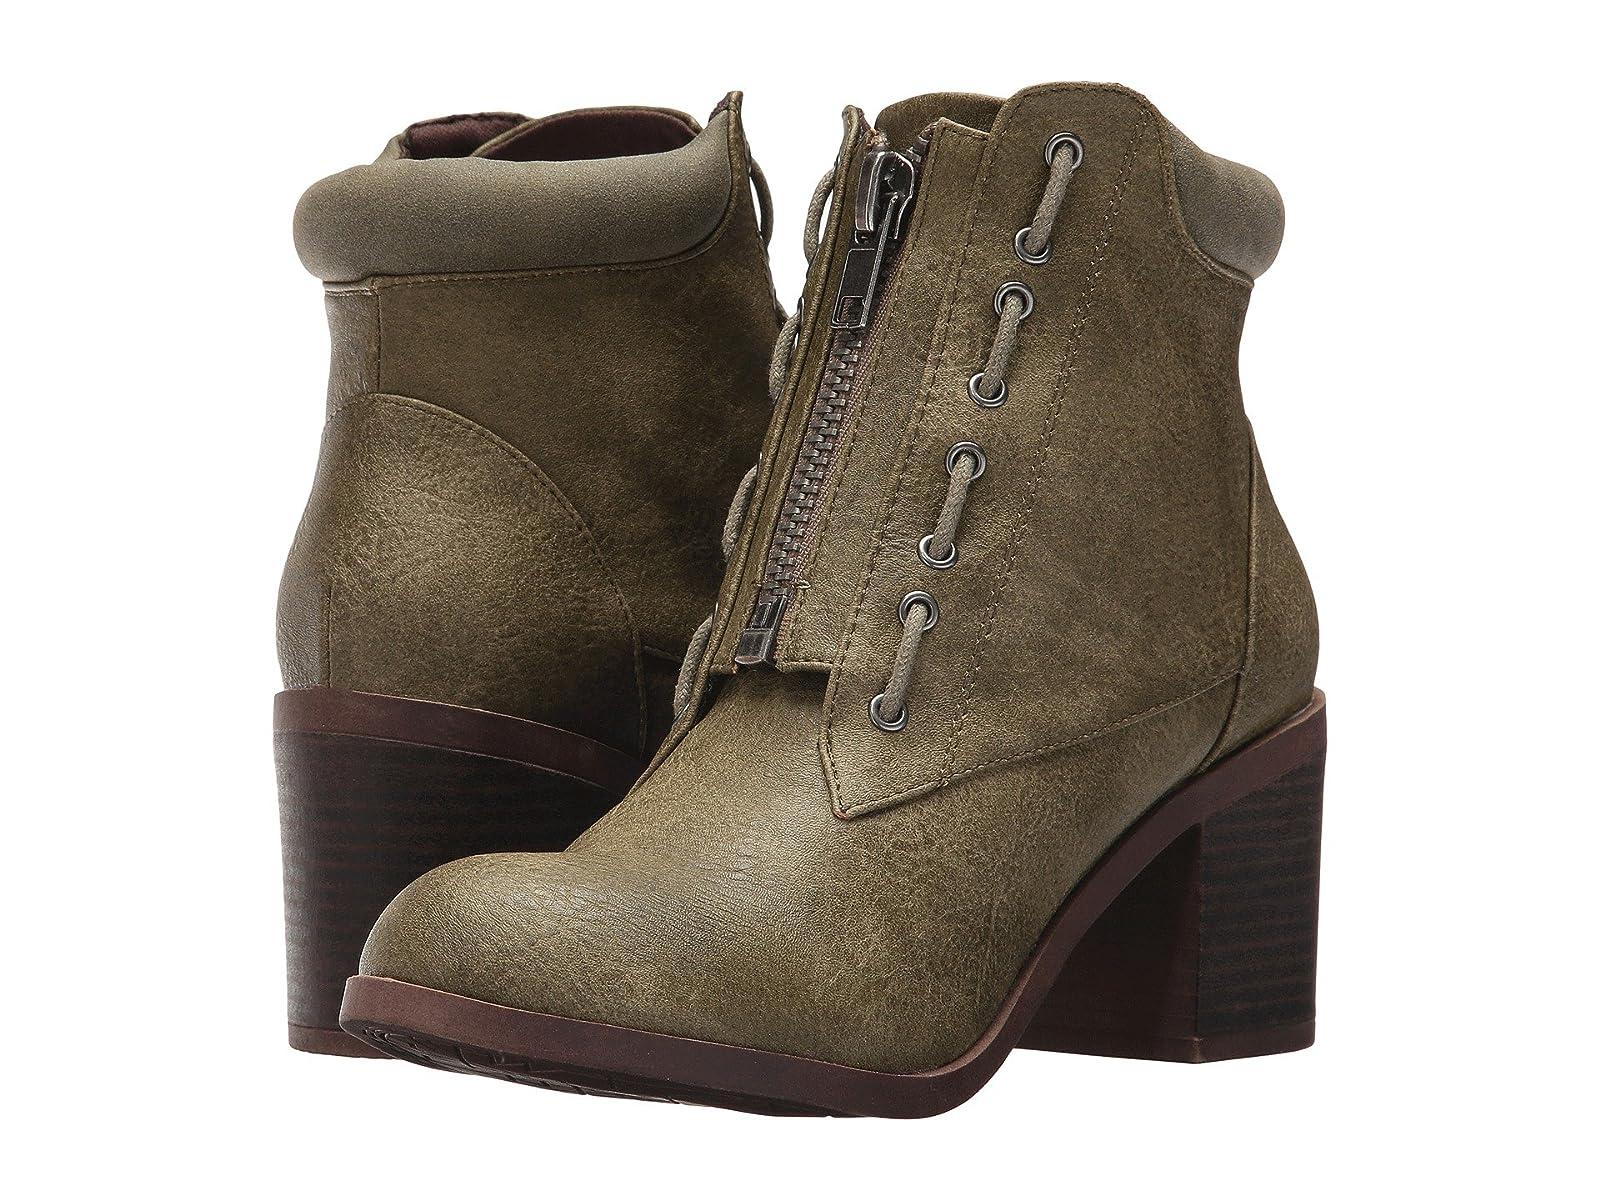 Michael Antonio SampsinCheap and distinctive eye-catching shoes